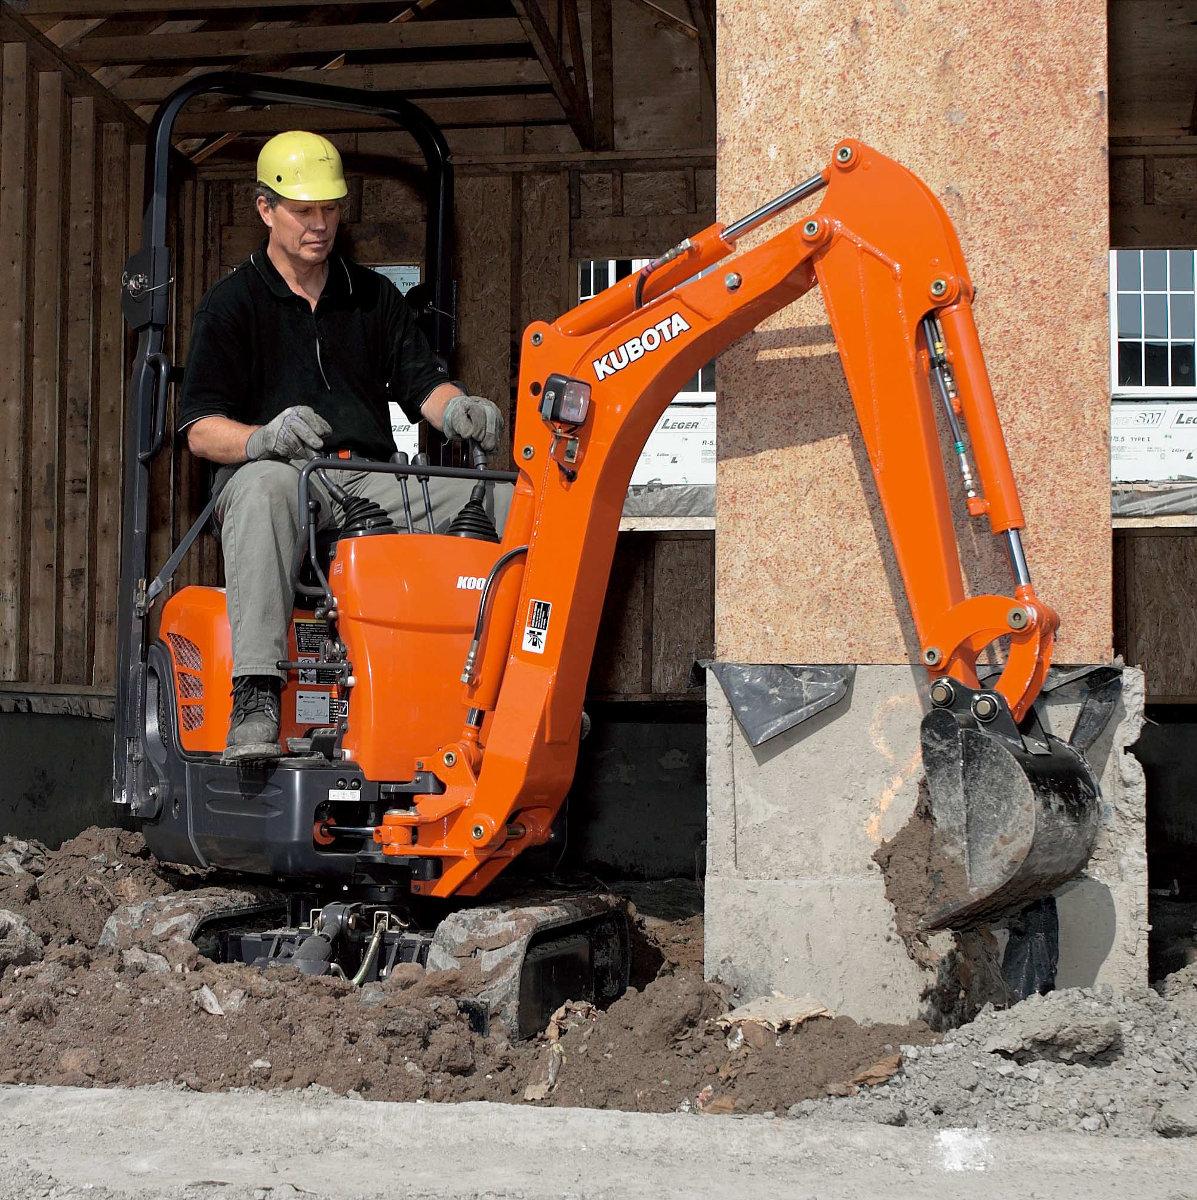 Mini Excavator / Mini Digger (0.8 Tonne) - Wellers Hire